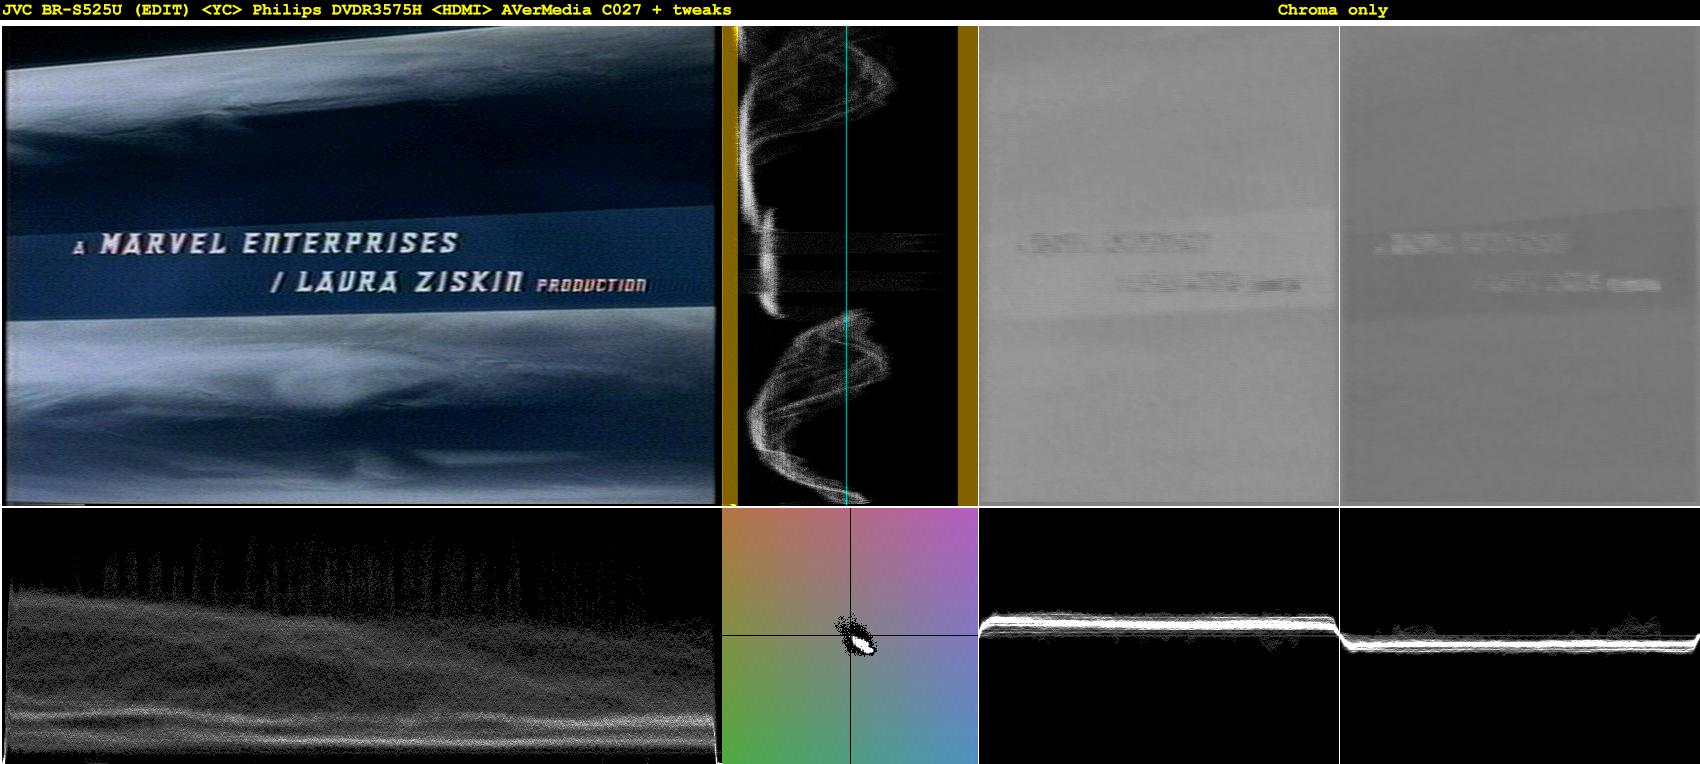 Click image for larger version  Name:0-09-01 - JVC BR-S525U (EDIT).png Views:1182 Size:931.4 KB ID:37665